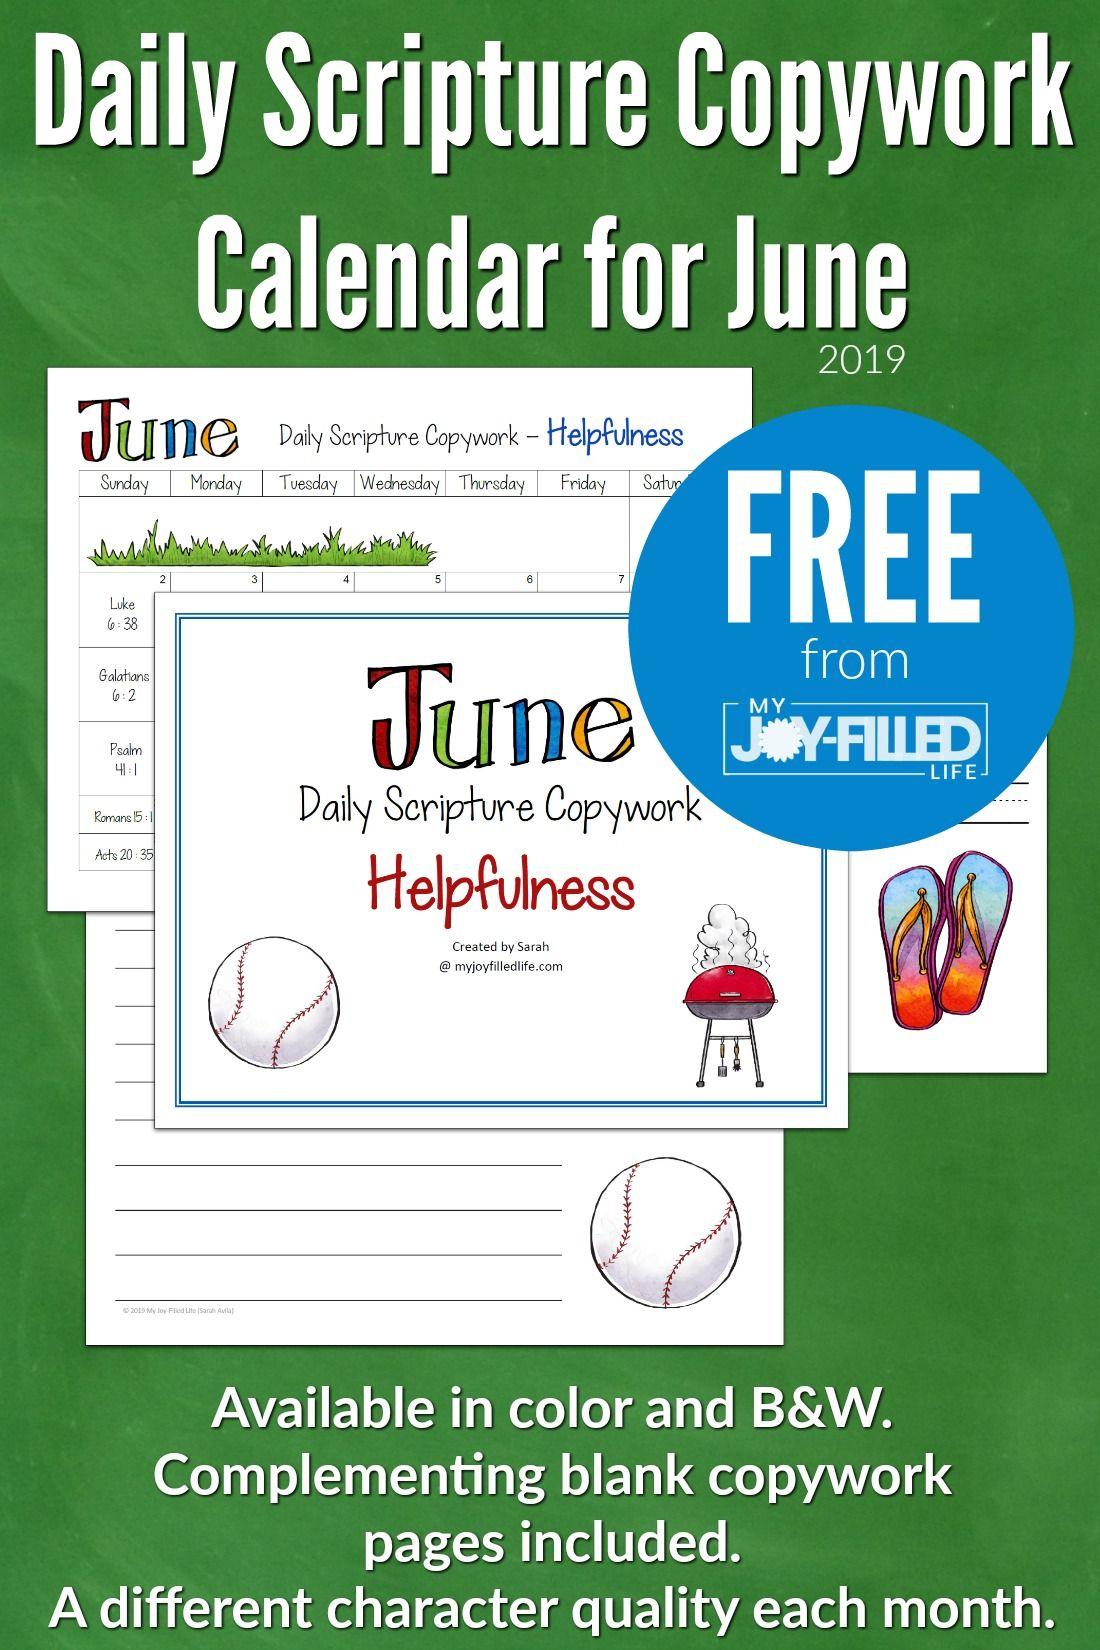 Daily Scripture Copywork Calendar For June